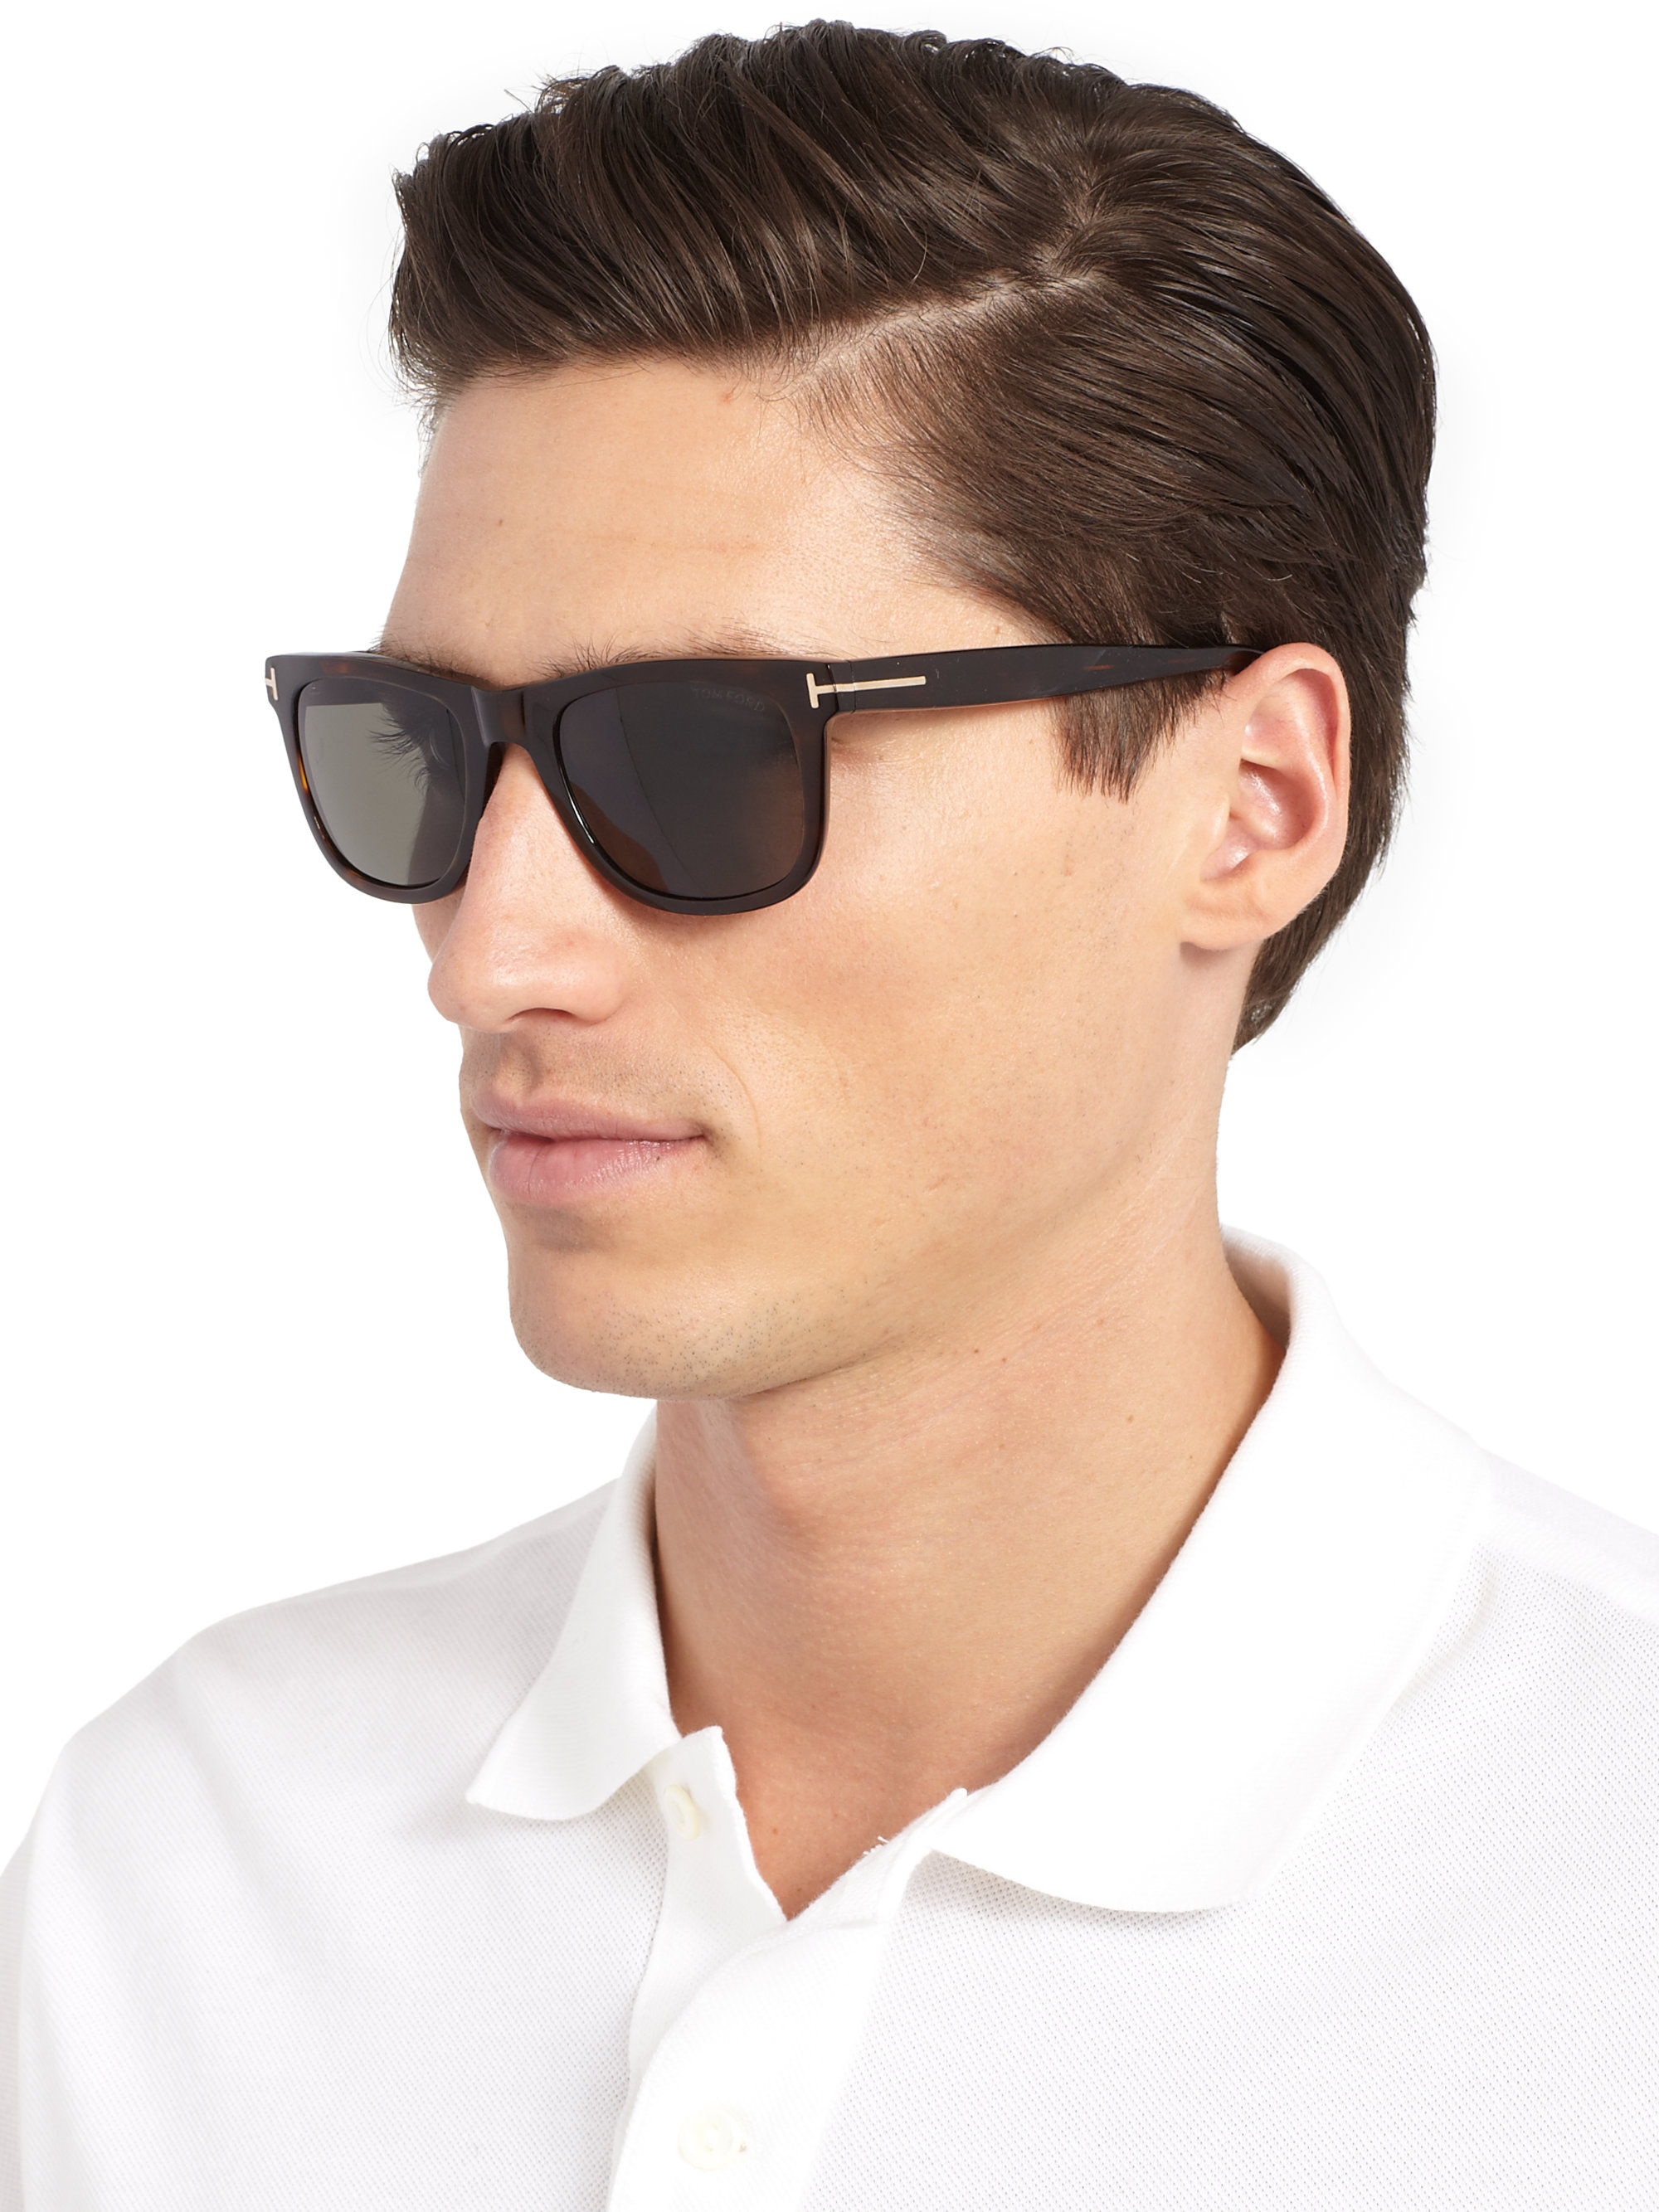 a031a1cbf6 Tom Ford Men s Havana Polarized Sunglasses - Wood in Black for Men ...